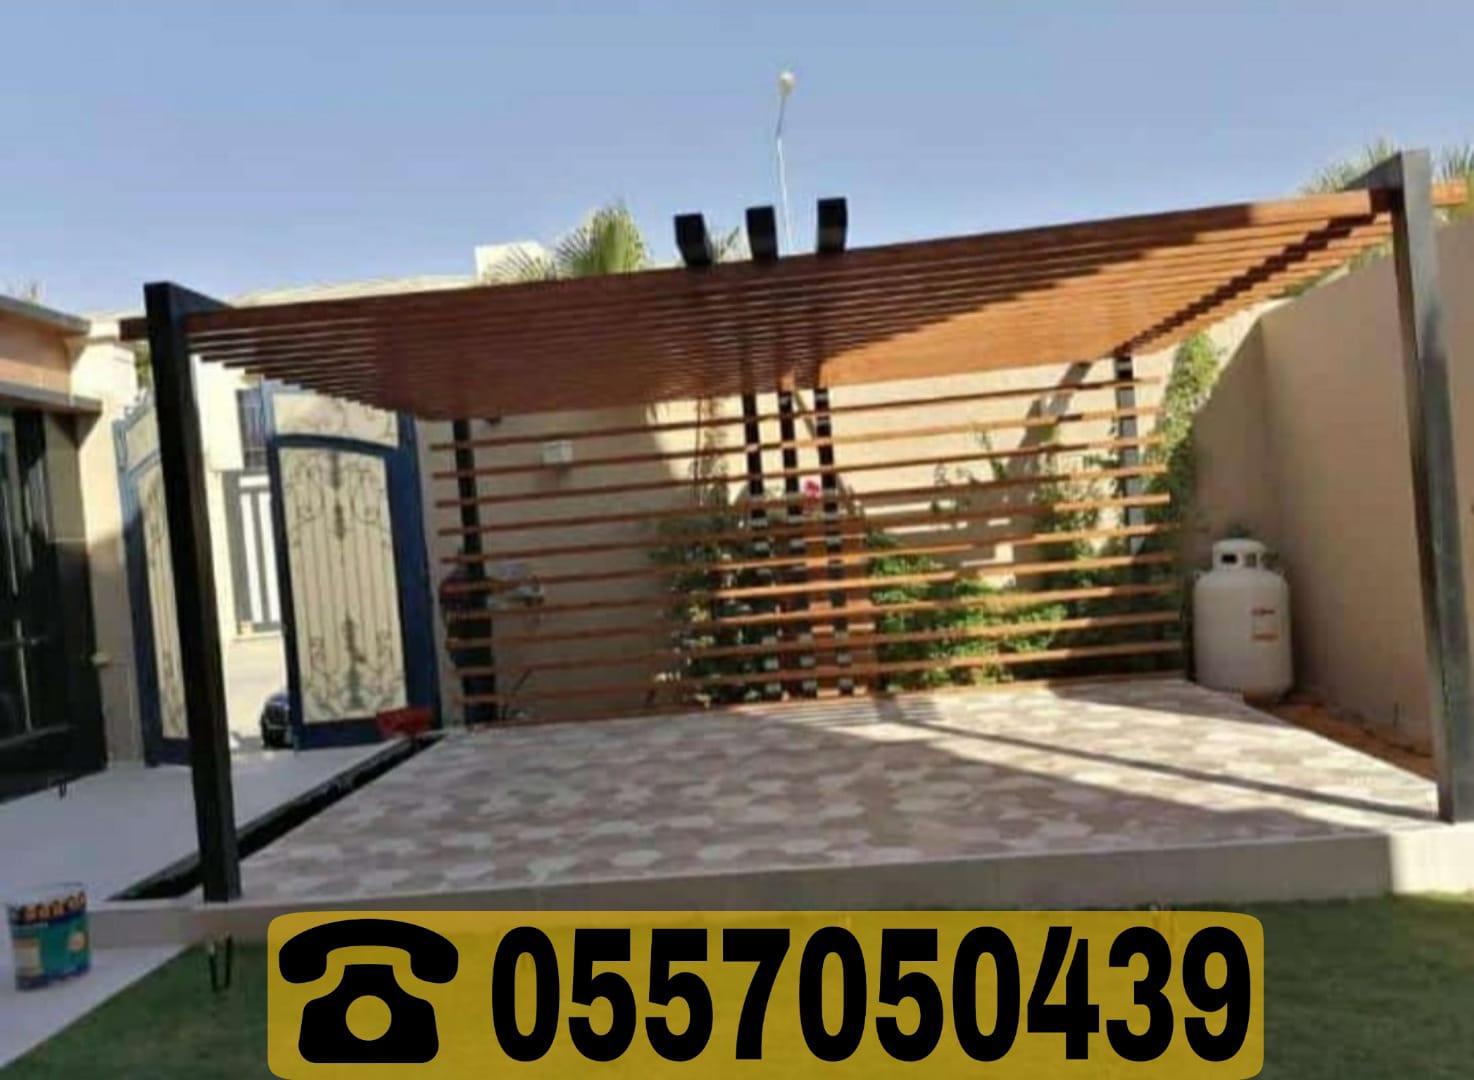 تركيب برجولات وجلسات حدائق للمنازل p_2055tchho8.jpg